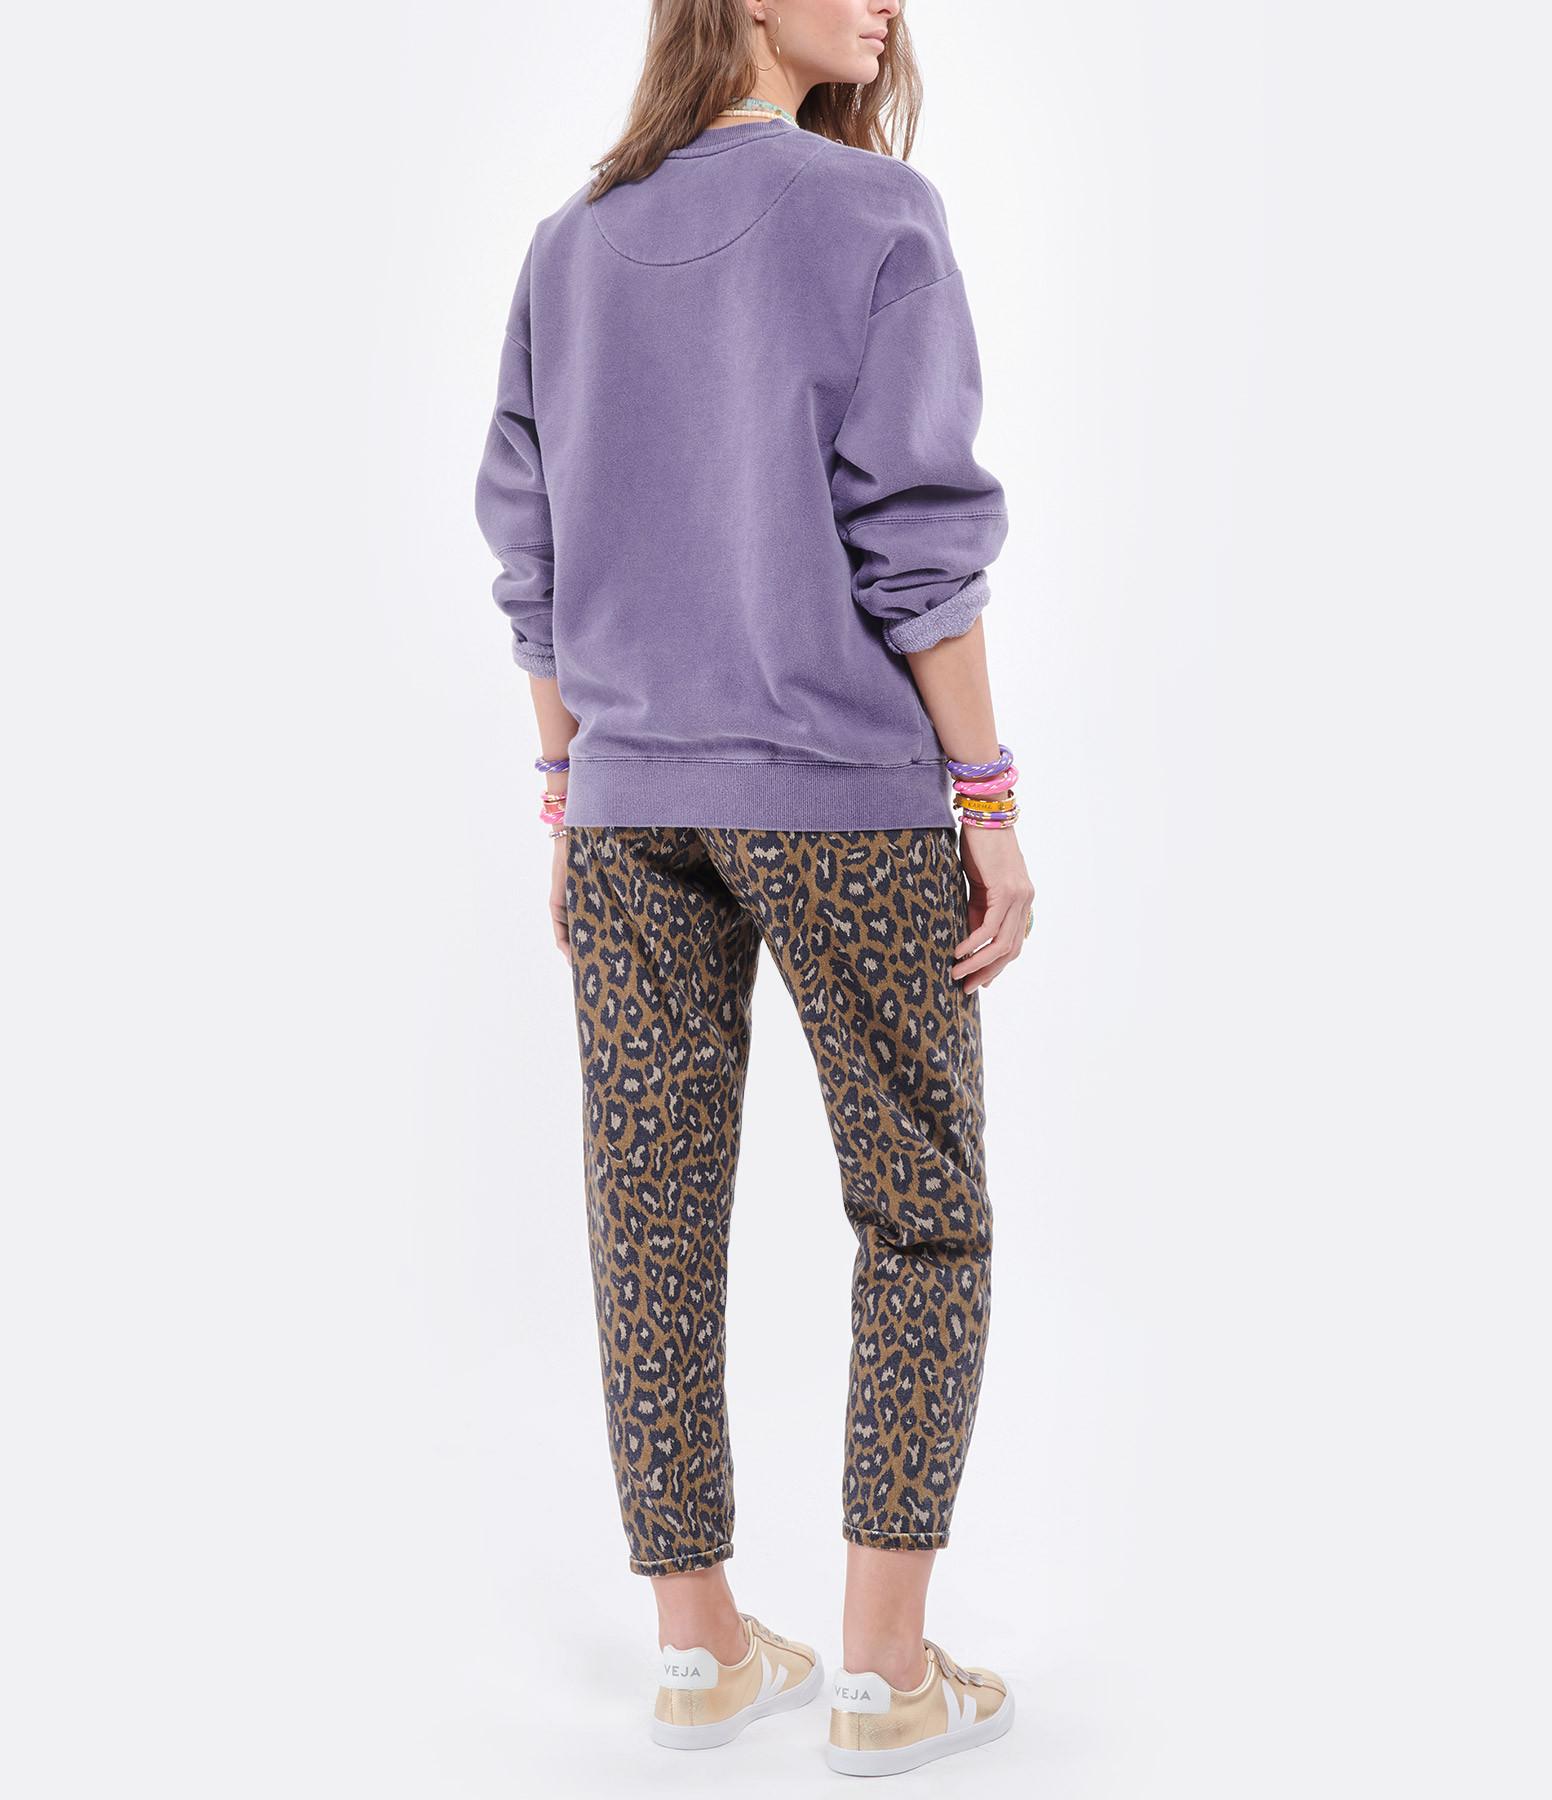 NEWTONE - Sweatshirt Roller Folk Coton Grappe